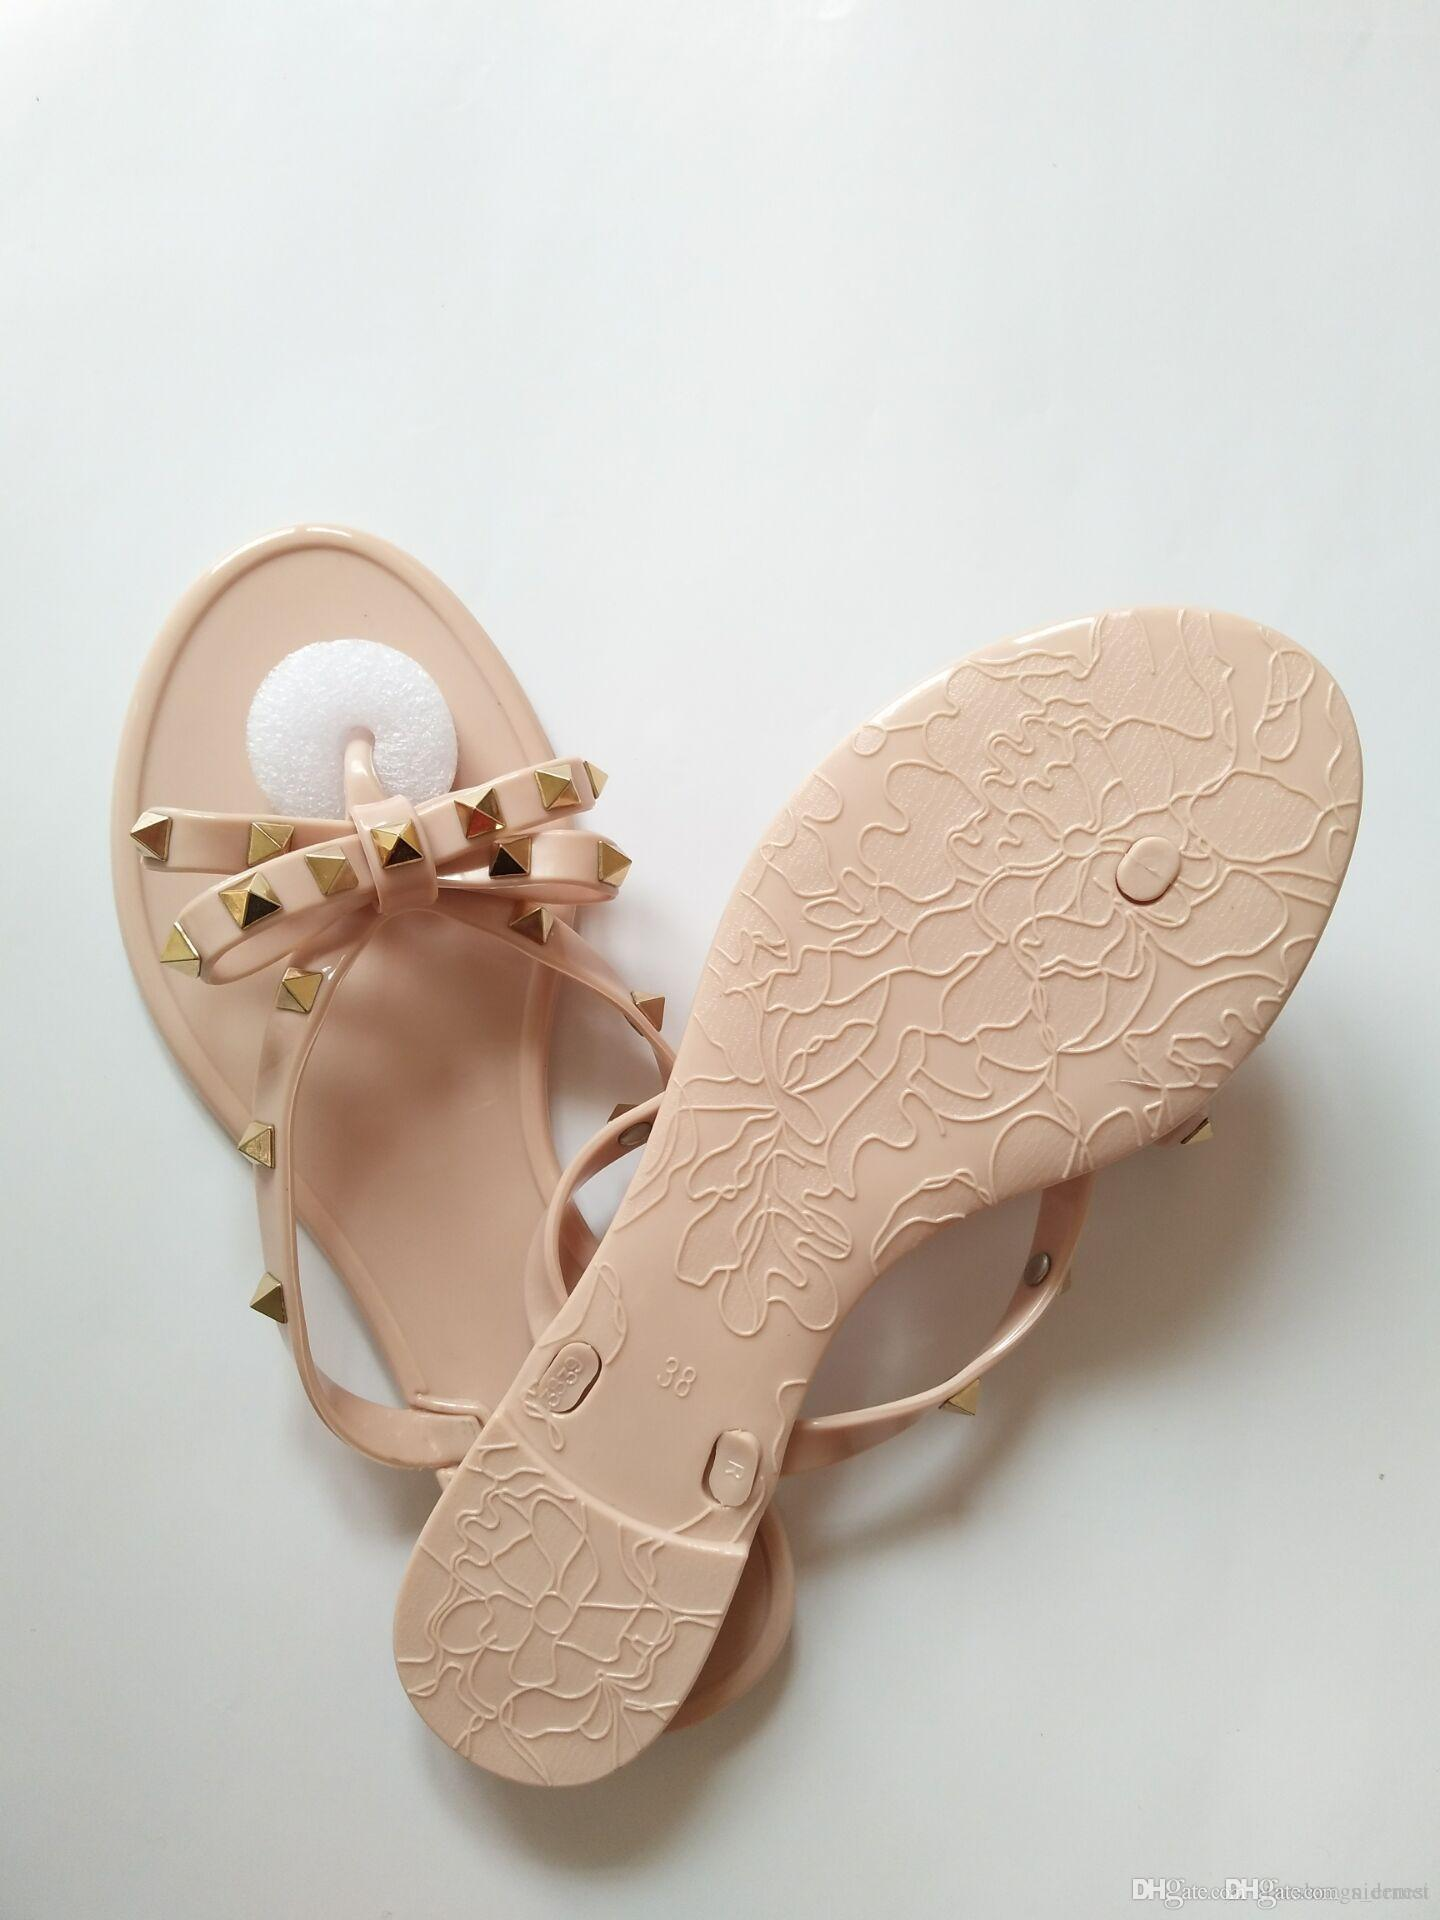 Nuovo 2018 Donna Sandali estivi Rivetti grande bowknot Infradito Spiaggia Sandali Femininas Flat Jelly Designer Sandali